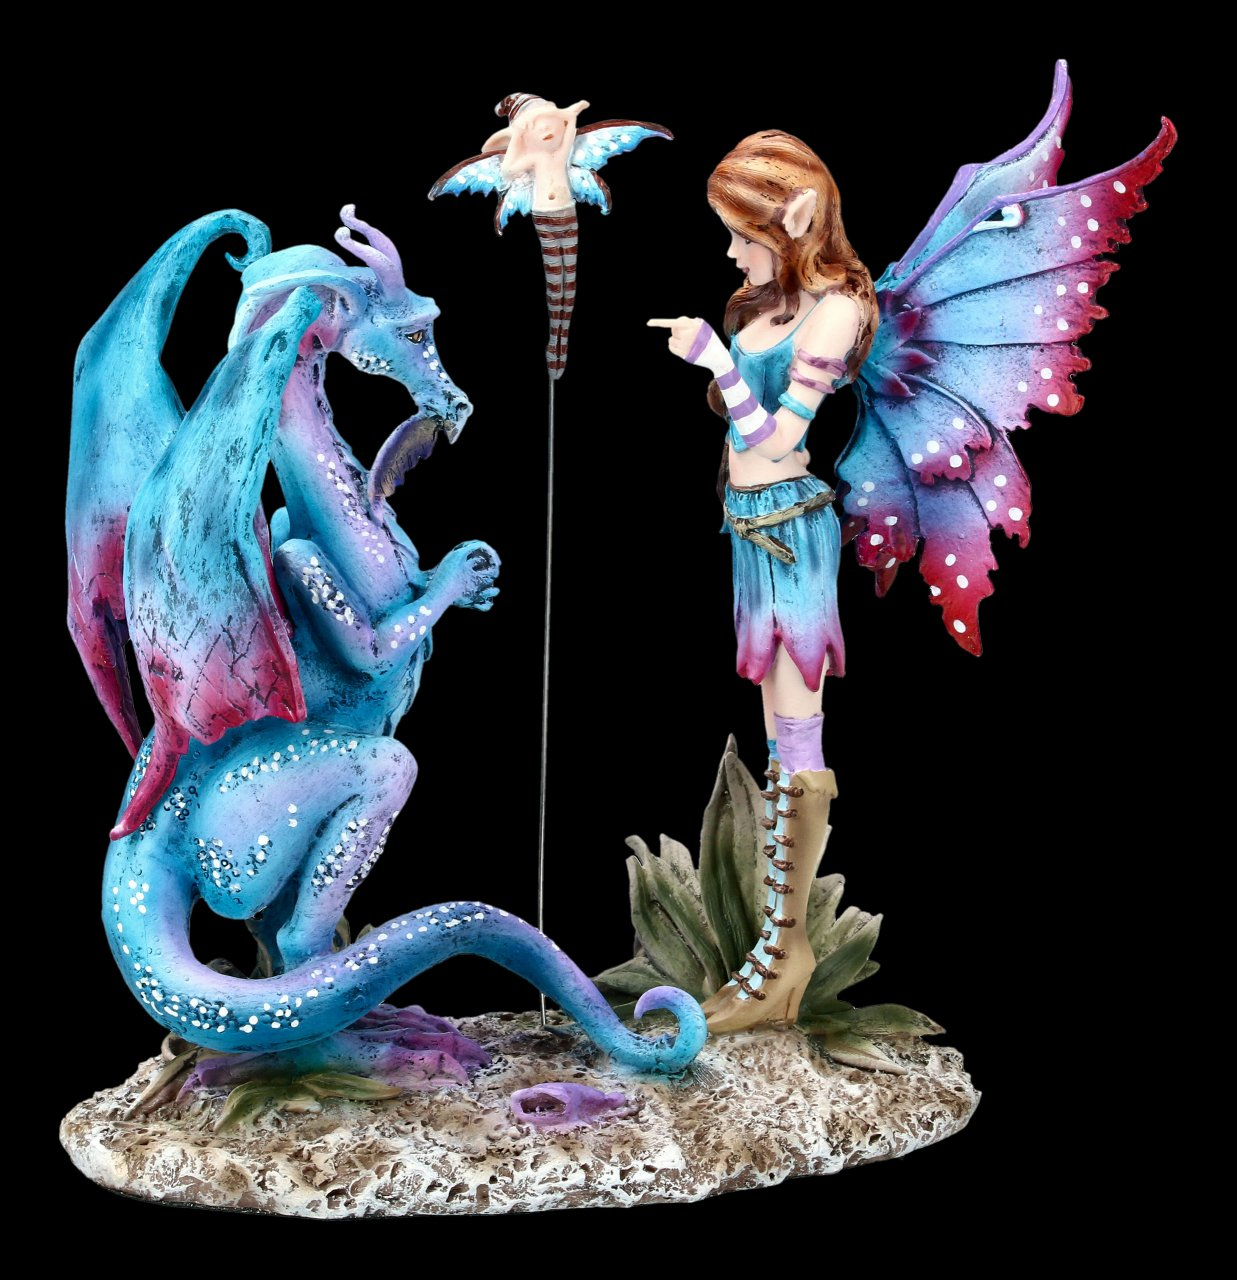 Fairy Figurine - Bad Dragon by Amy Brown